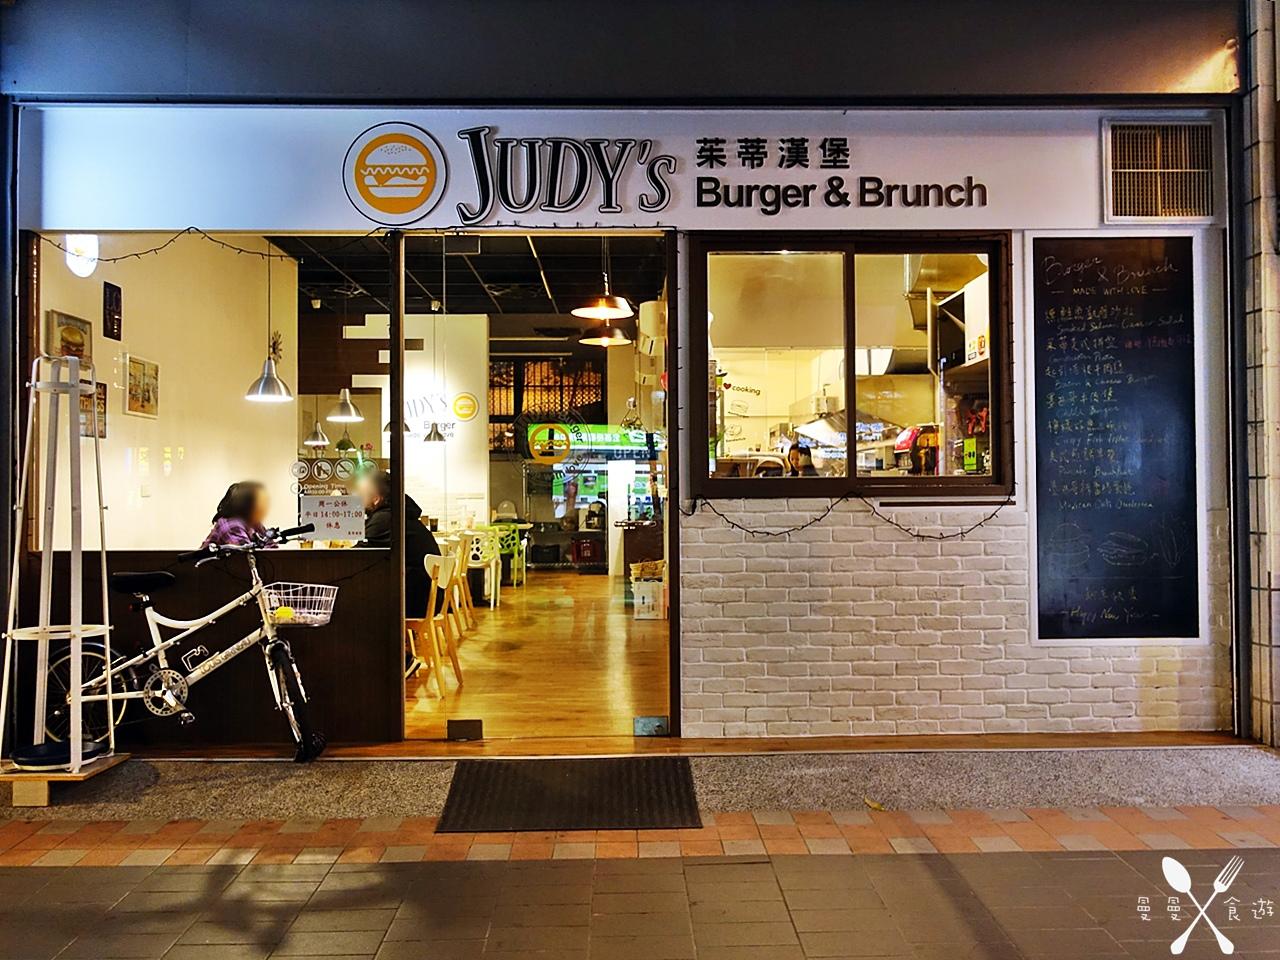 JudysBurger-1